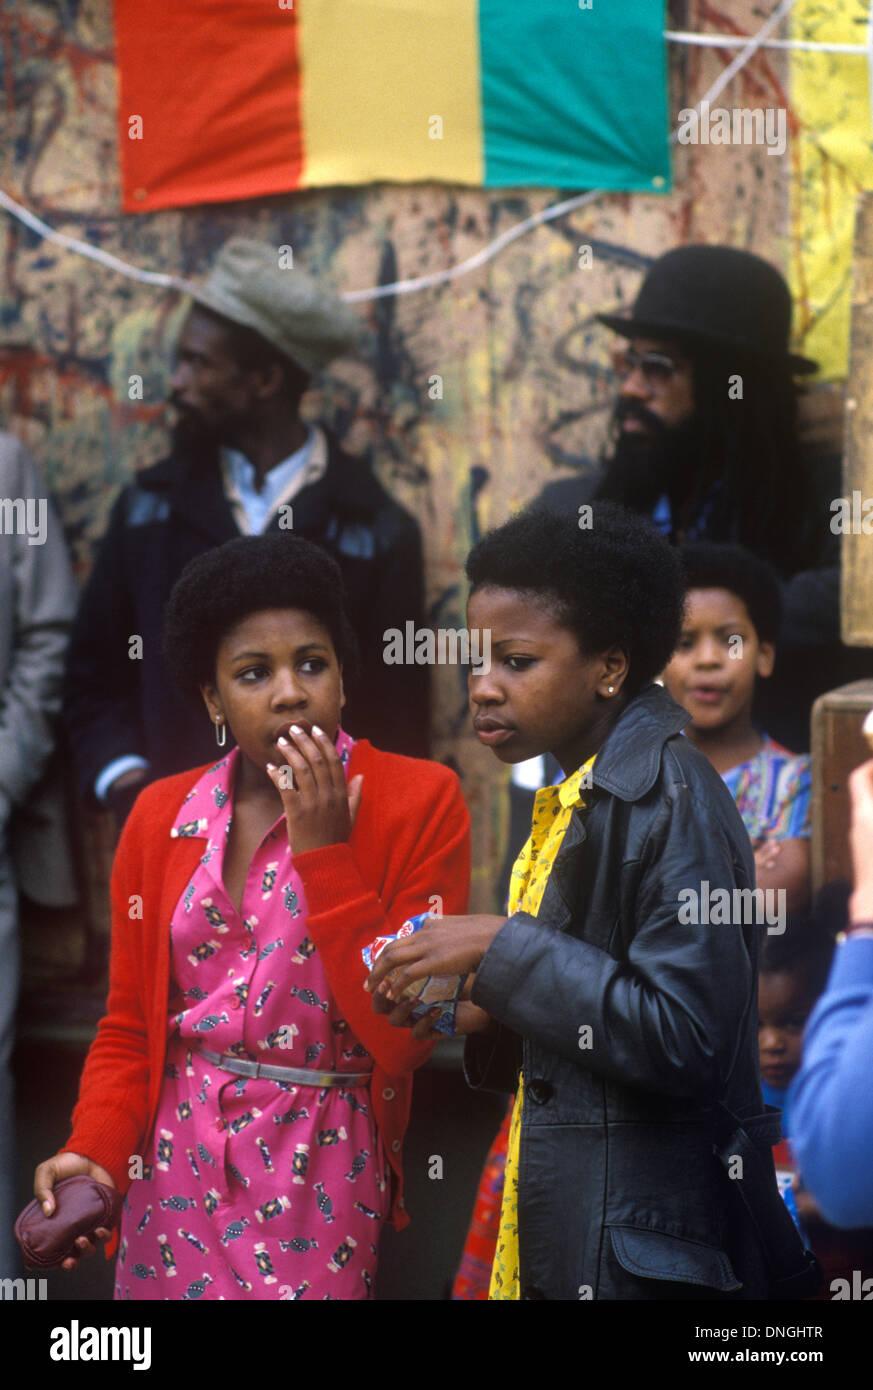 Teen black girls Notting Hill west London 1970s 70s multiethnic Britain UK HOMER SYKES - Stock Image